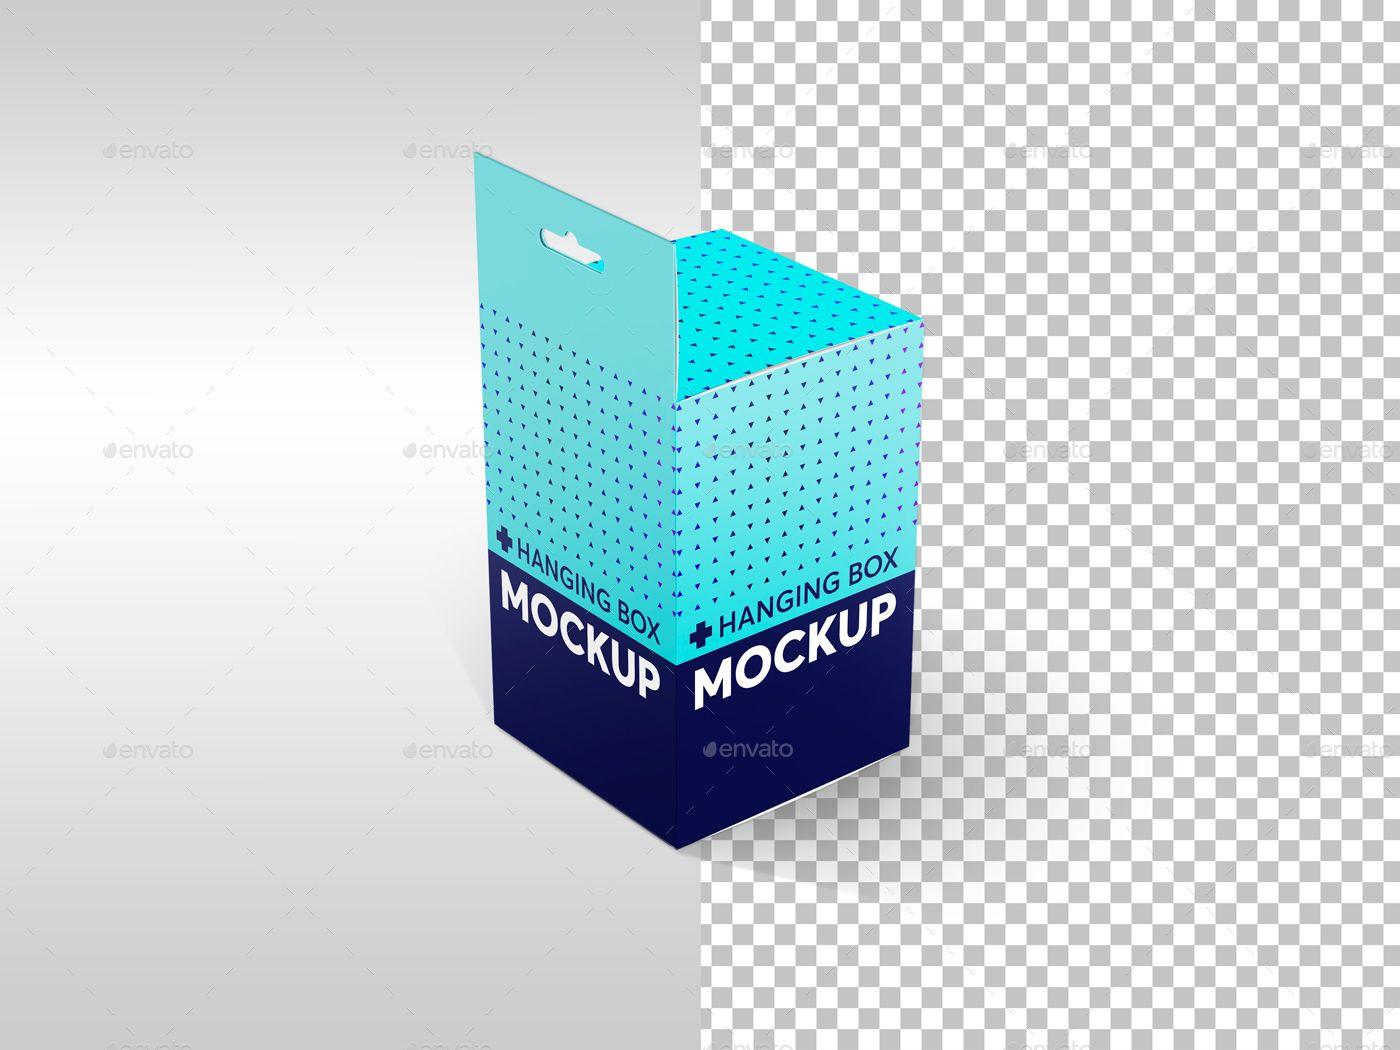 Download Hanging Square Box Mockups V 2 Square Hanging Mockups Box Box Mockup Box Packaging Design Graphic Design Typography